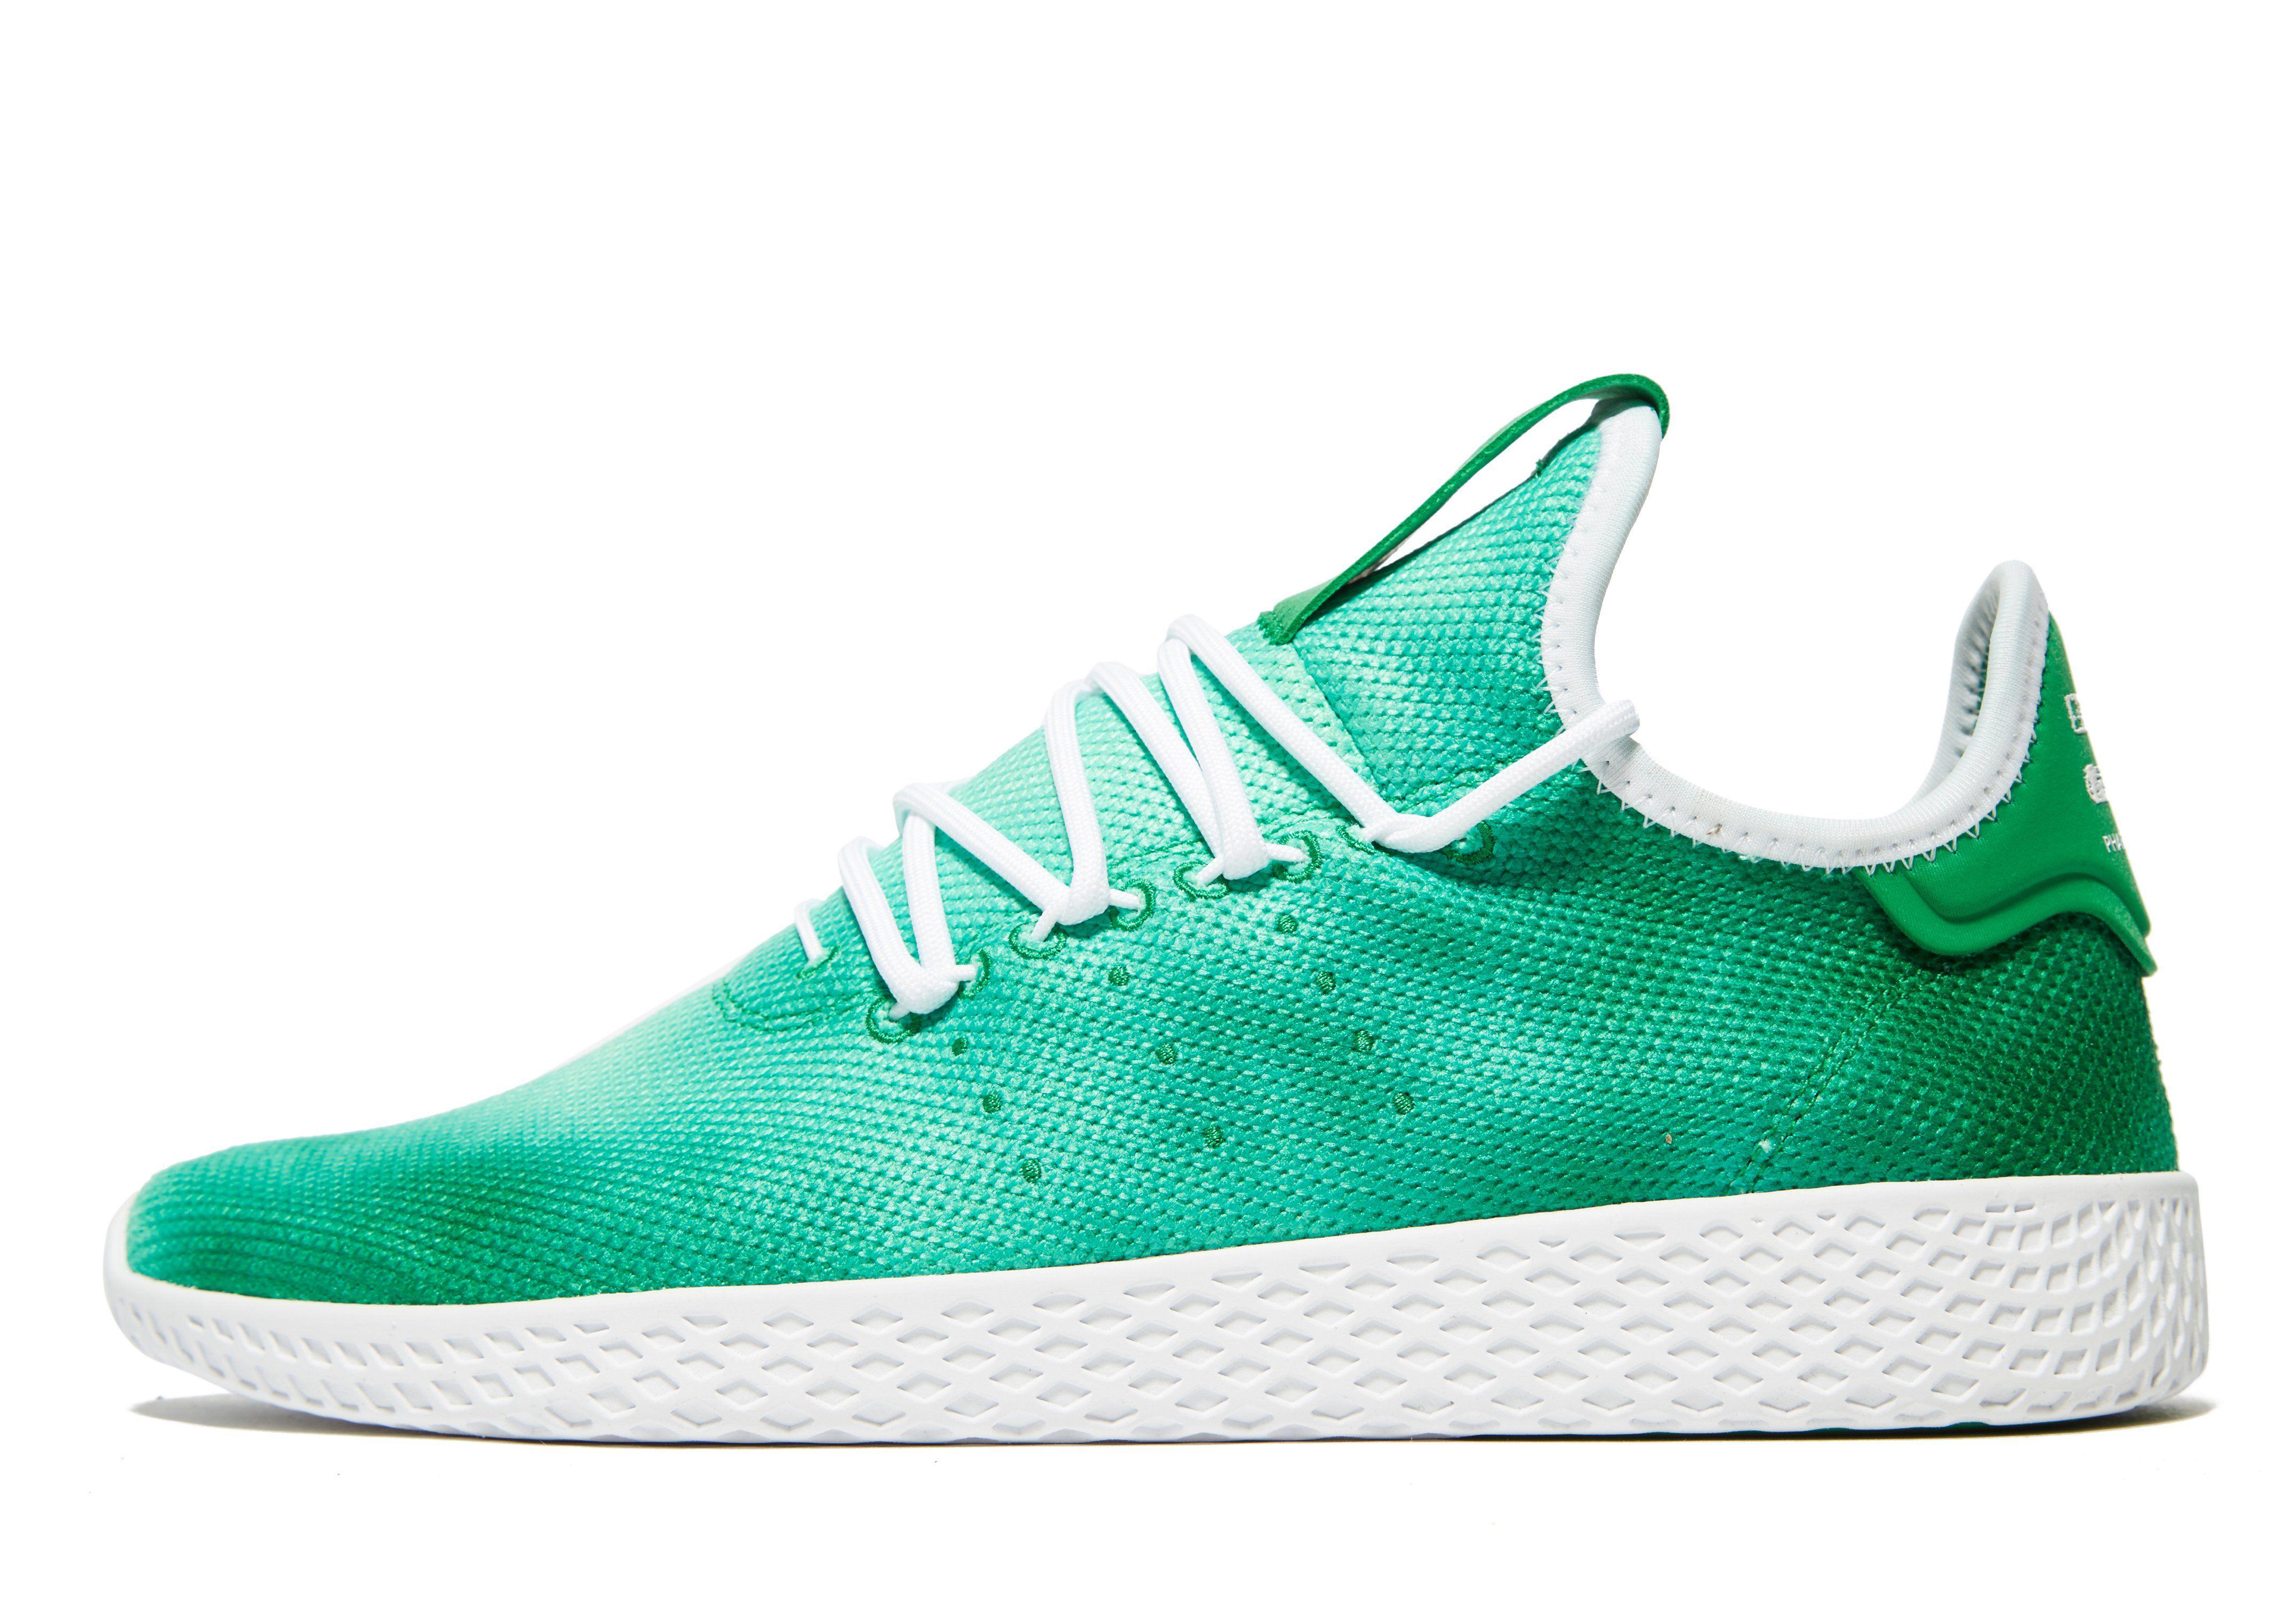 adidas Originals Pharrell Williams Tennis Hu Holi Green Venta Paga Con Paypal Outlet De Venta Barata Precio Increíble oTHI8